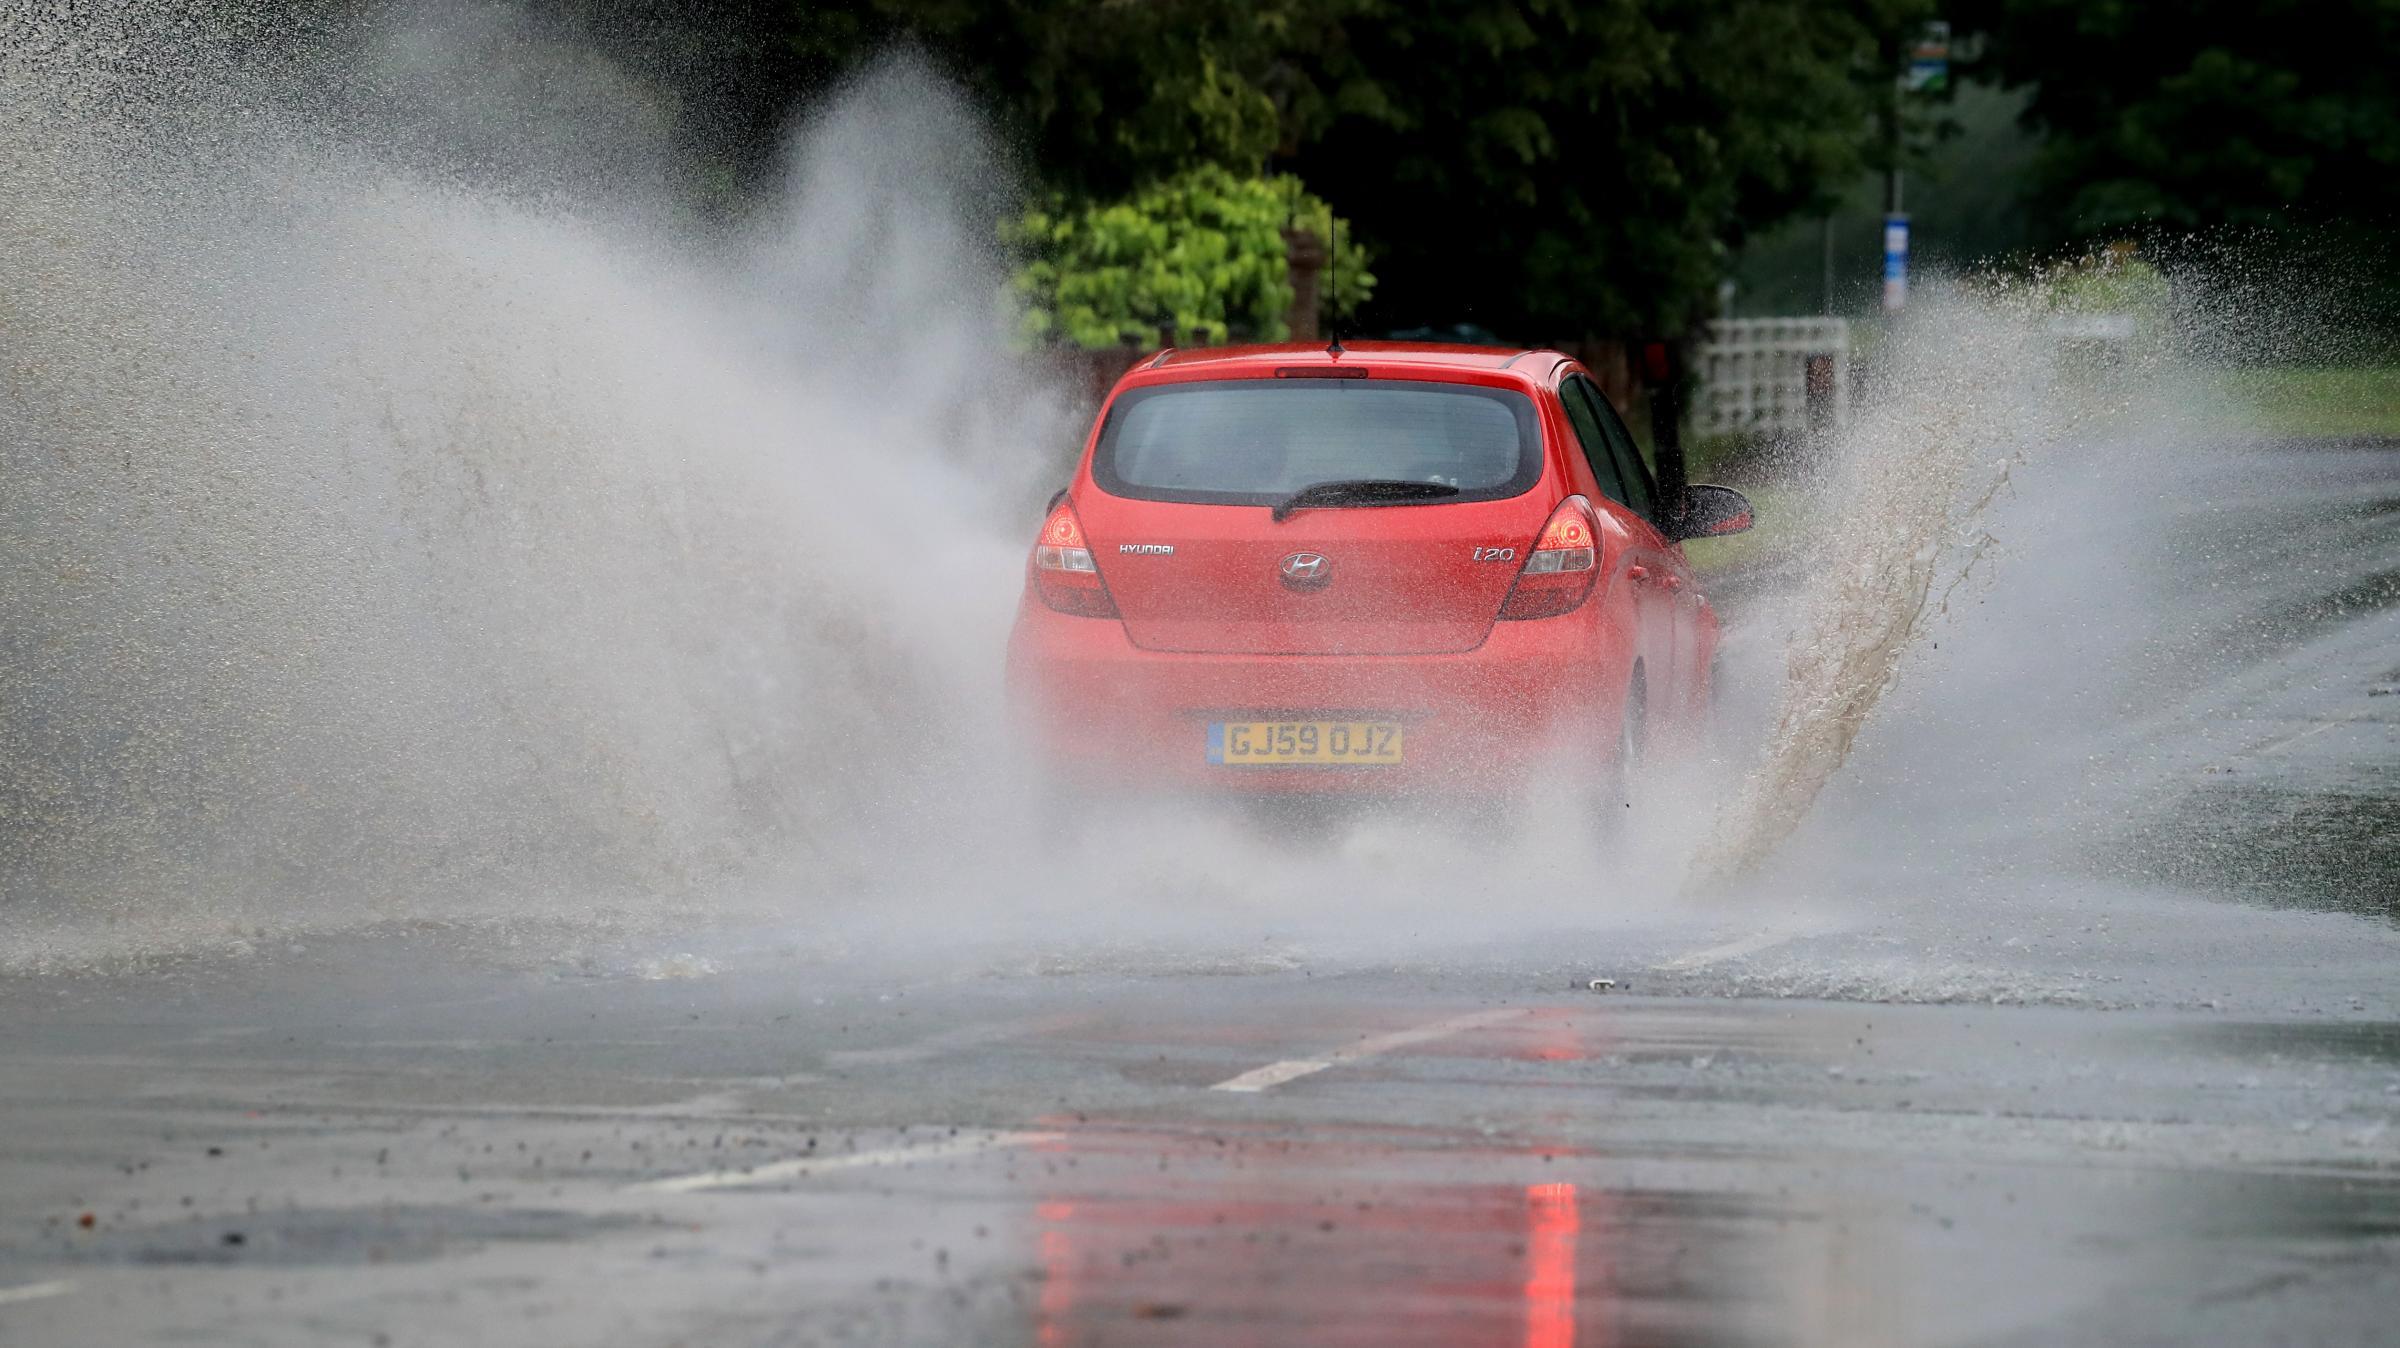 Heavy rain prompts 'treacherous' conditions warning